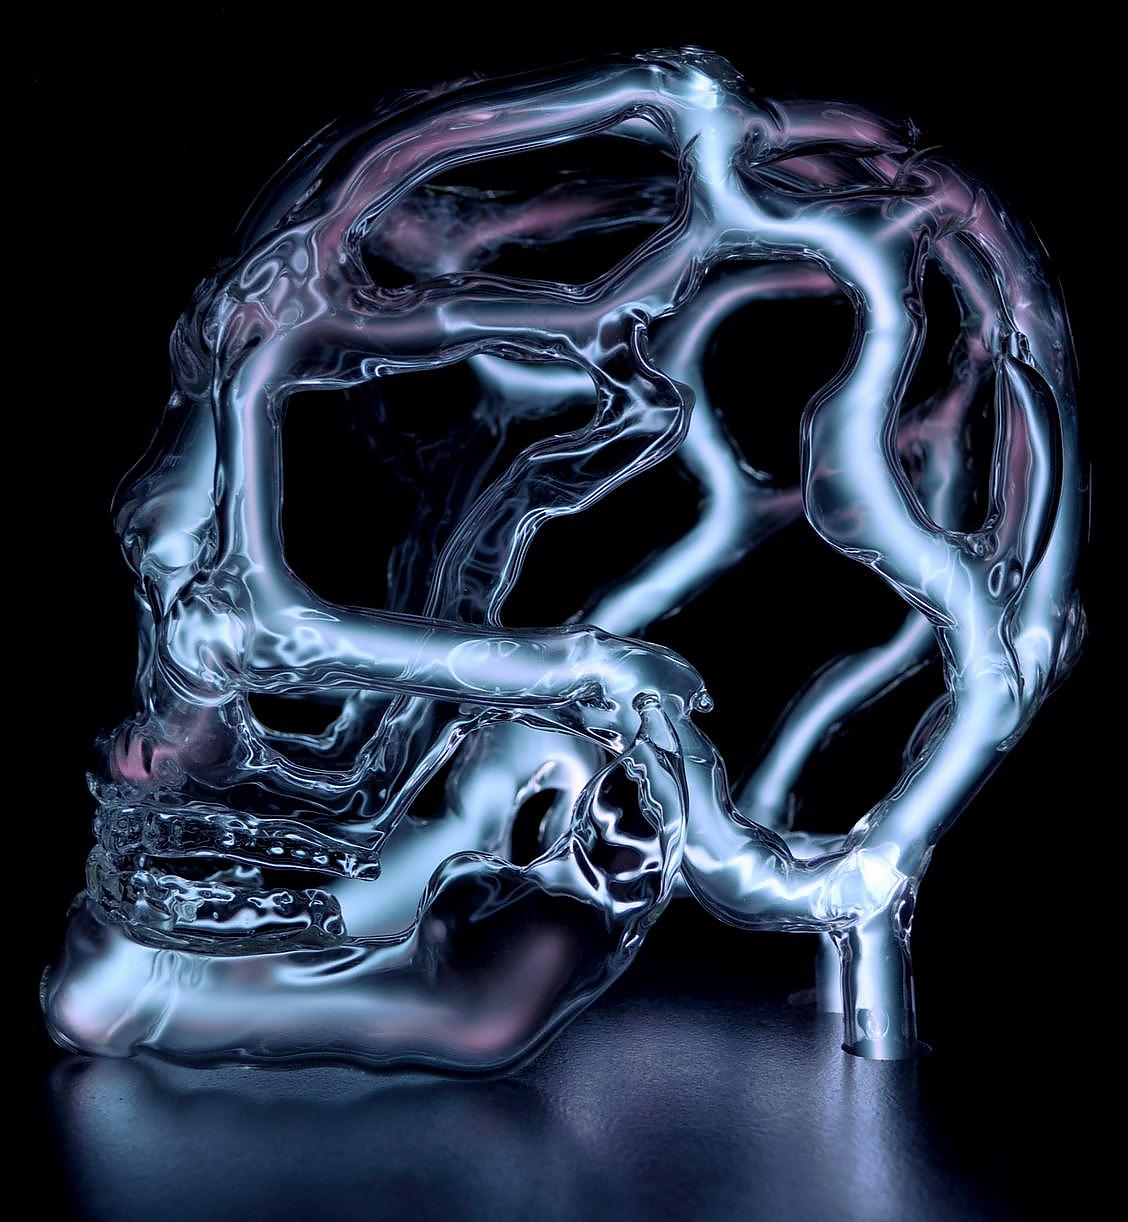 Luminous Skull Sculptures by Eric Franklin.